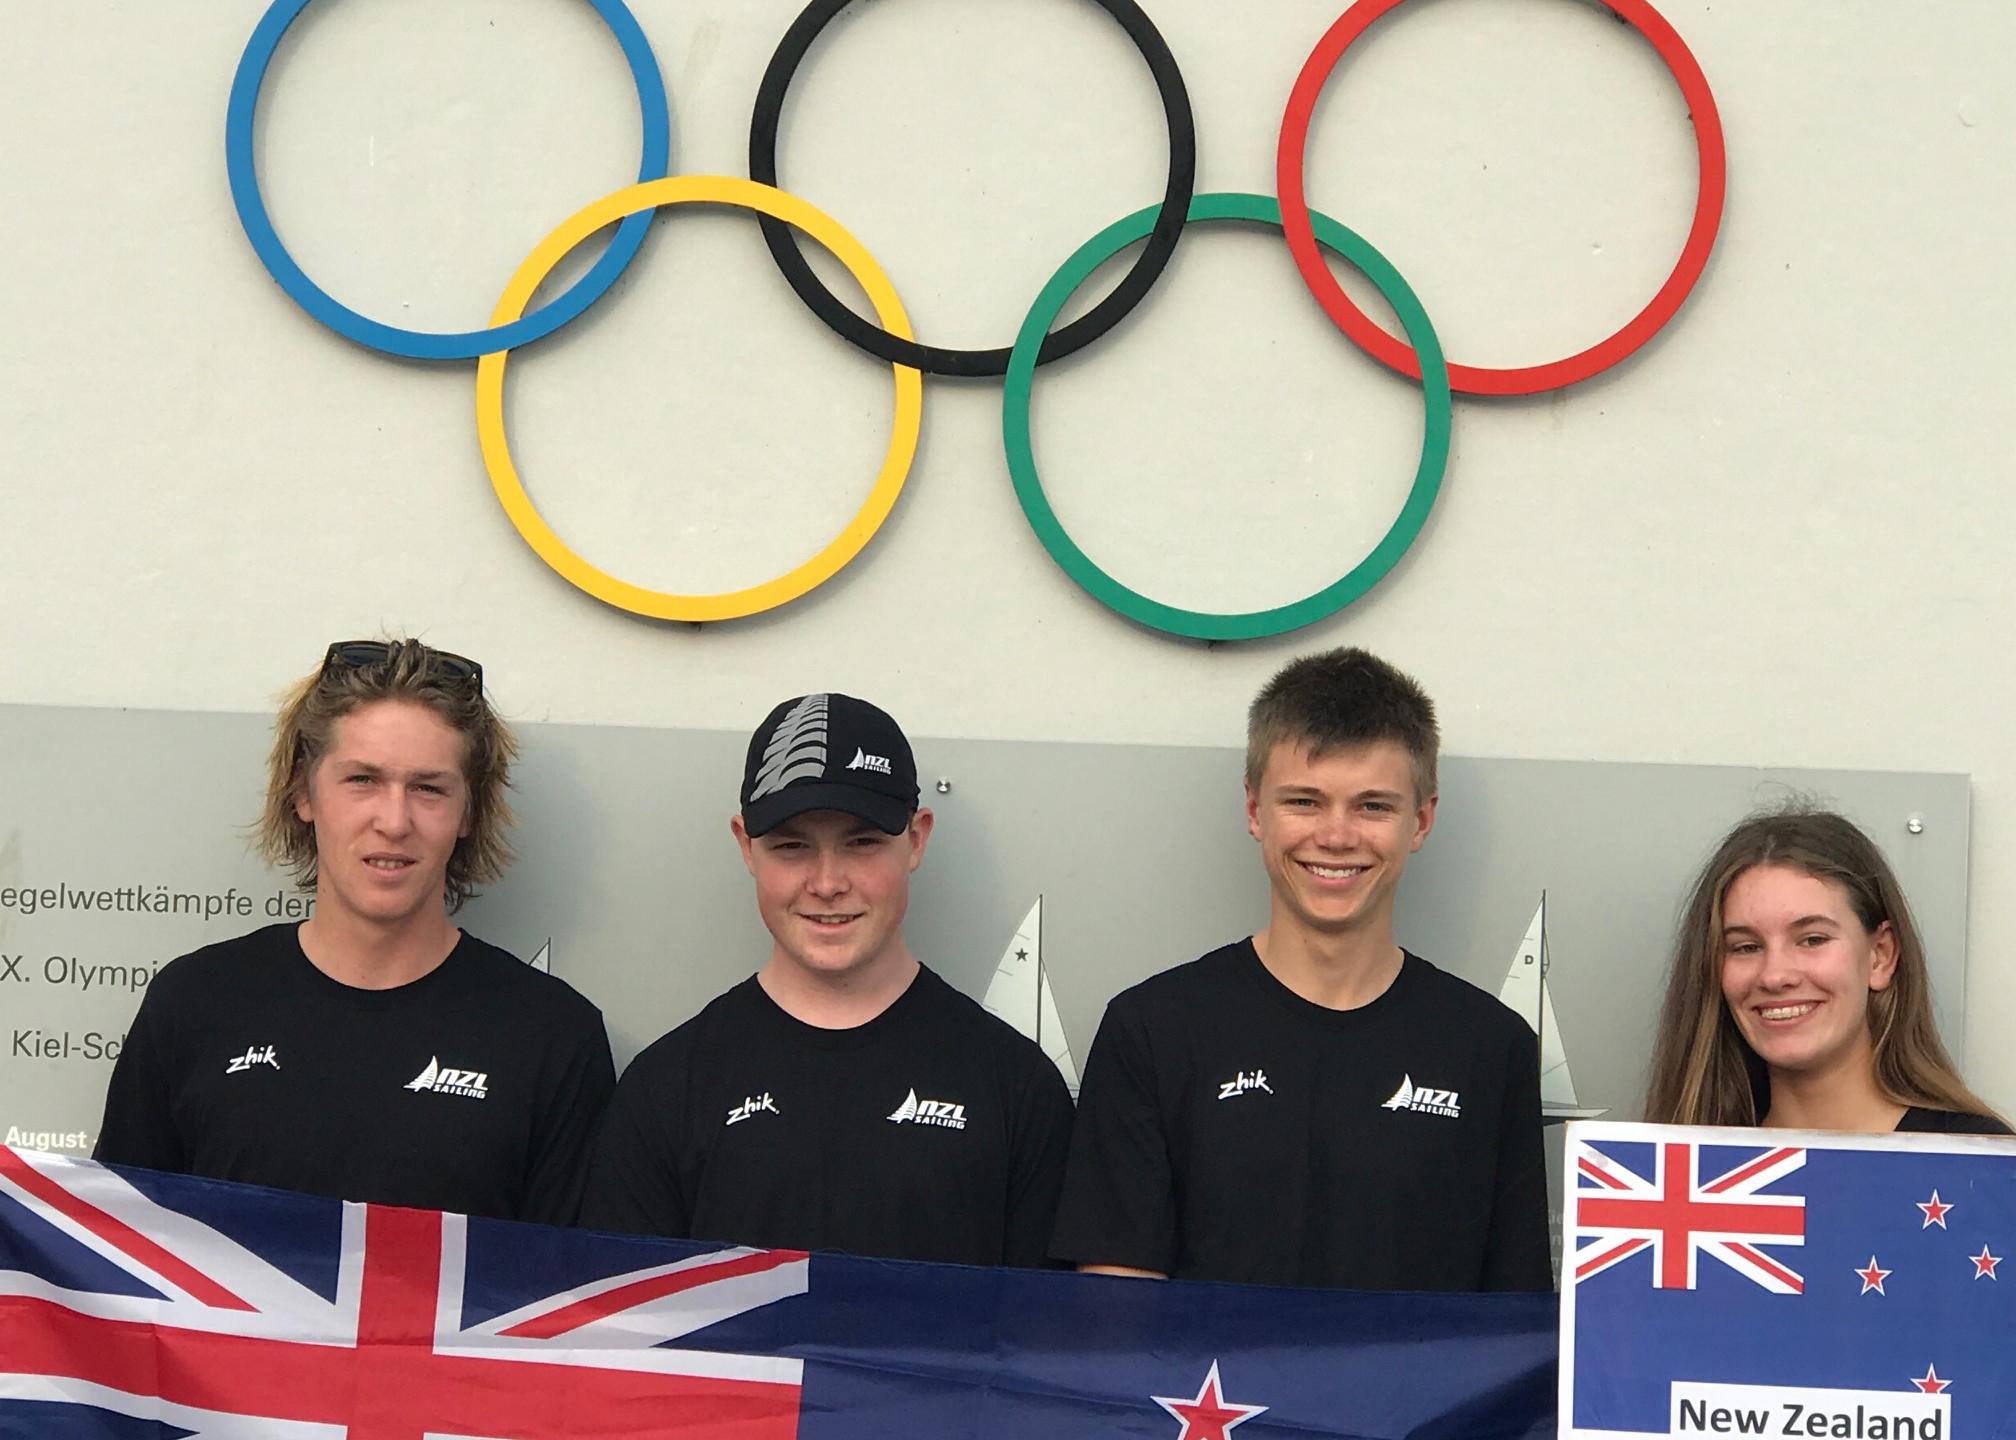 NZ Representatives